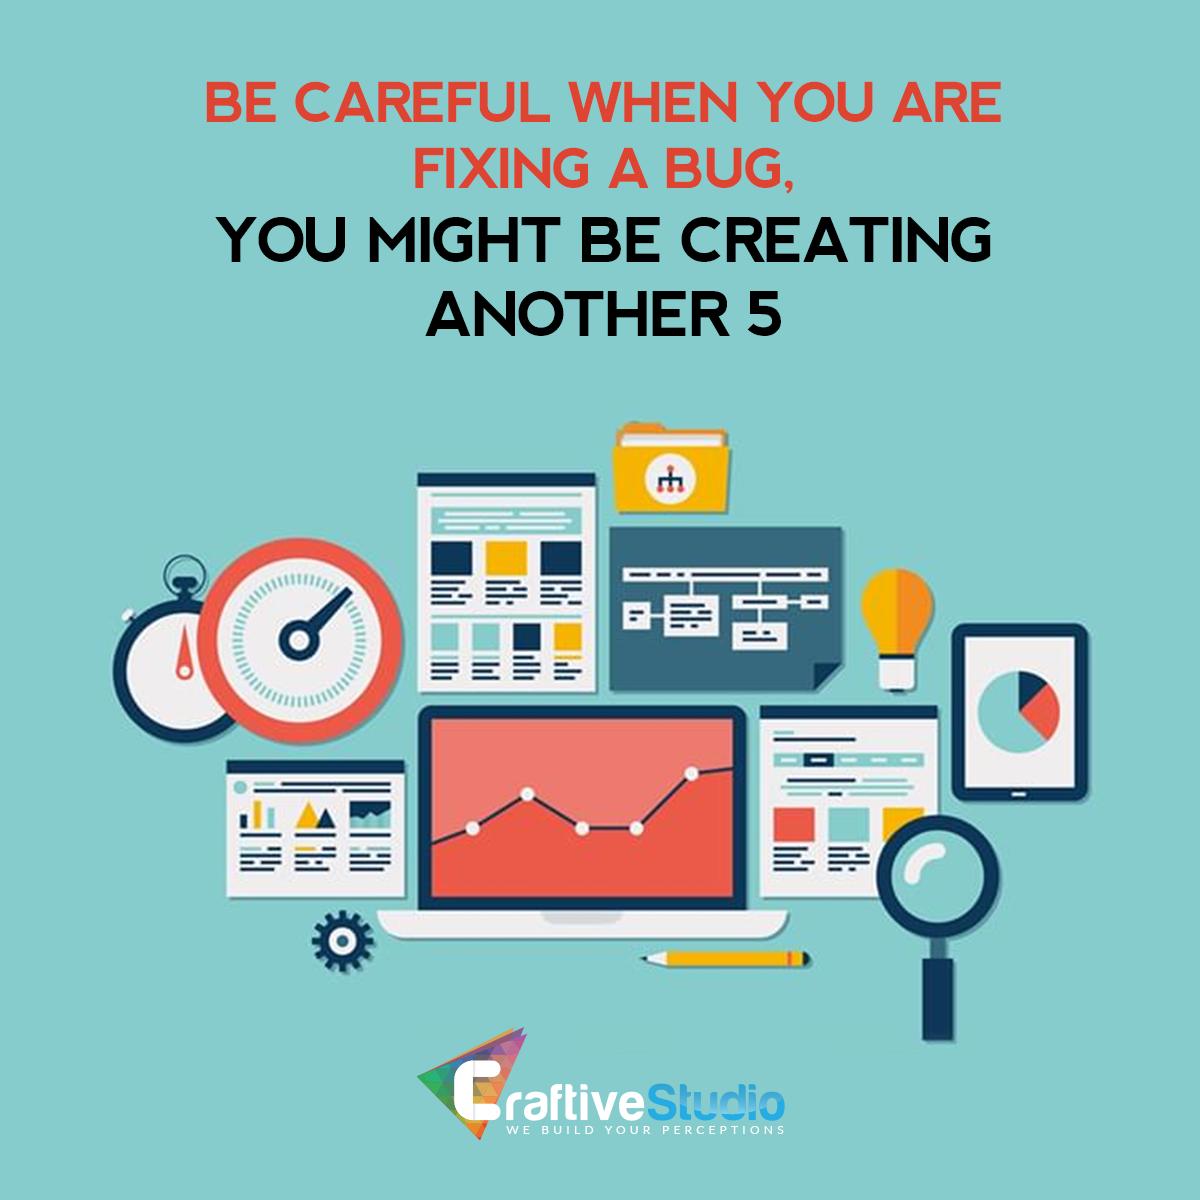 Just Be Very Cautious Webdevelopment Programming Coding Infographic Marketing Web Development Design Web Development Company